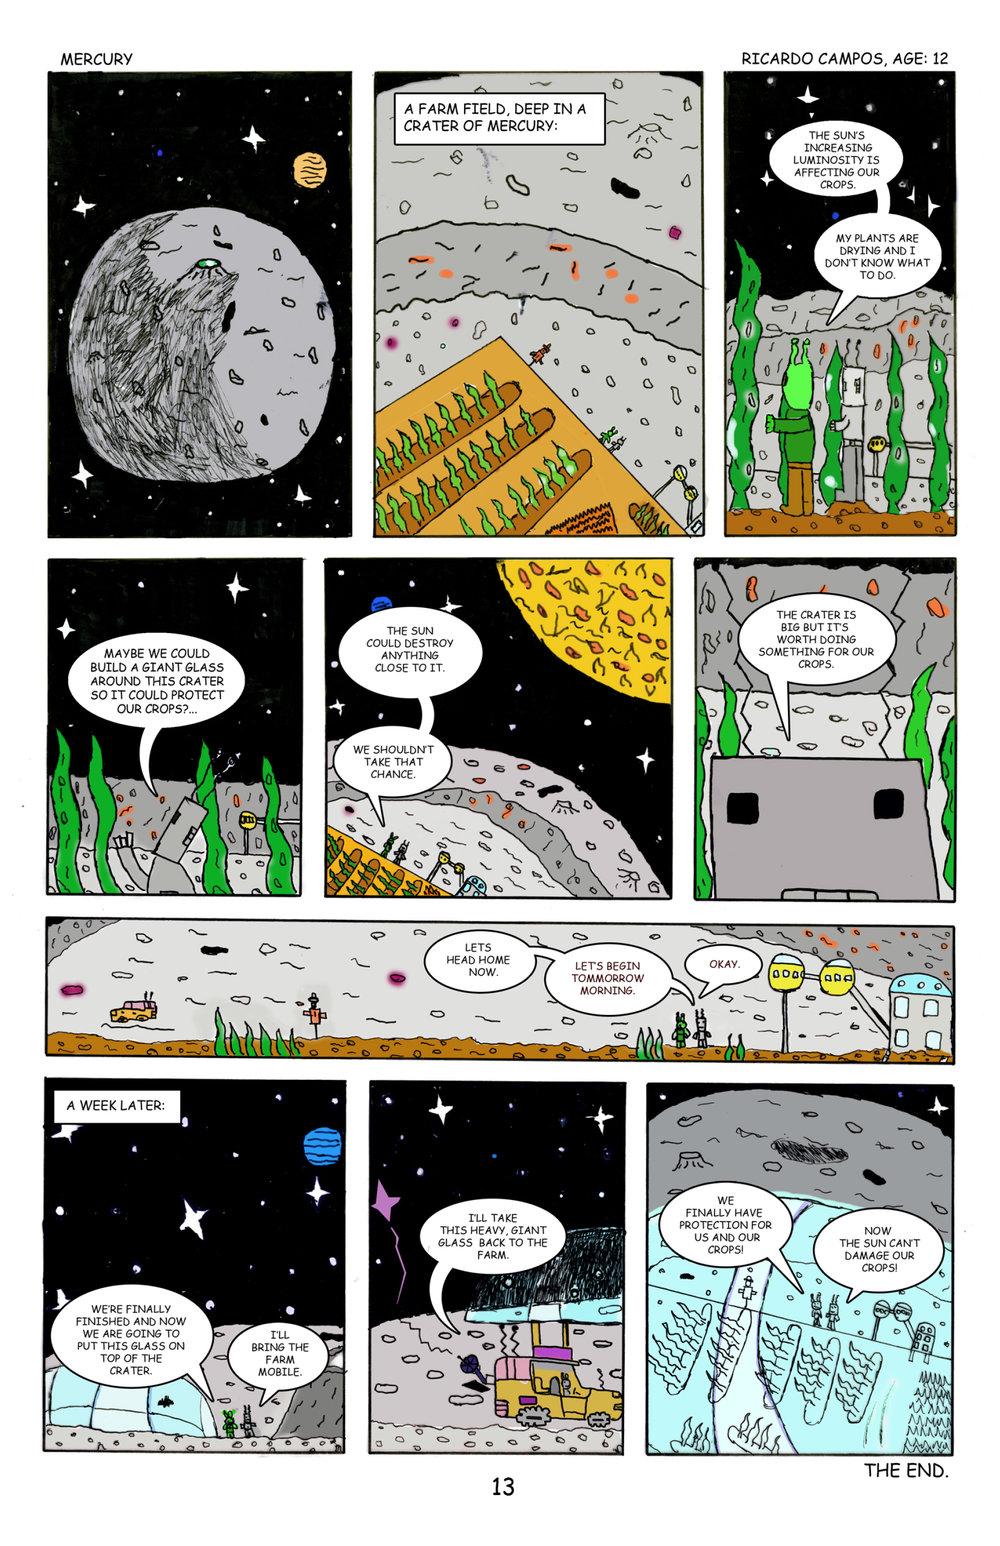 htw page 13.jpg